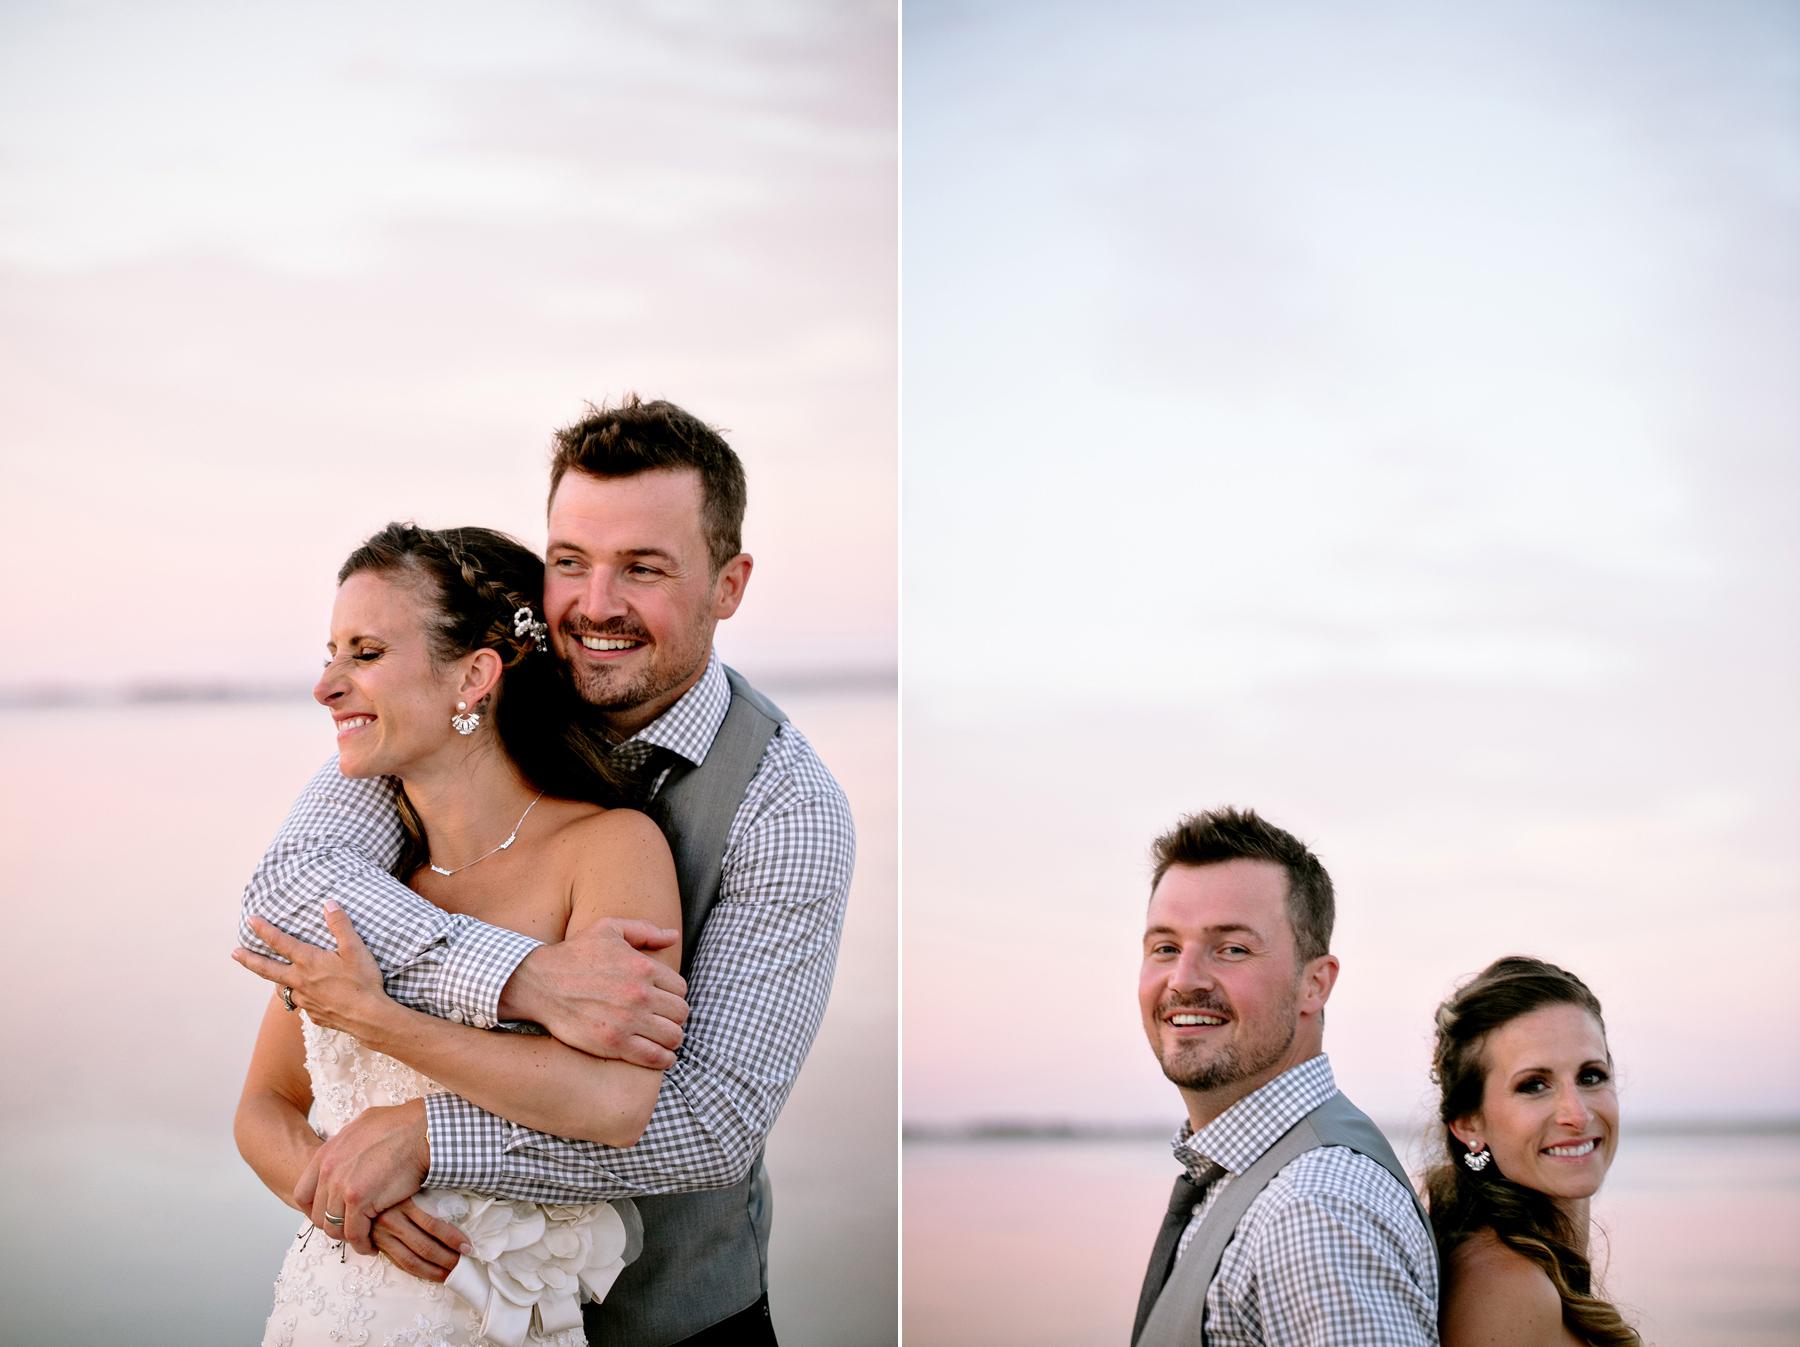 060-awesome-pei-wedding-photography-kandisebrown